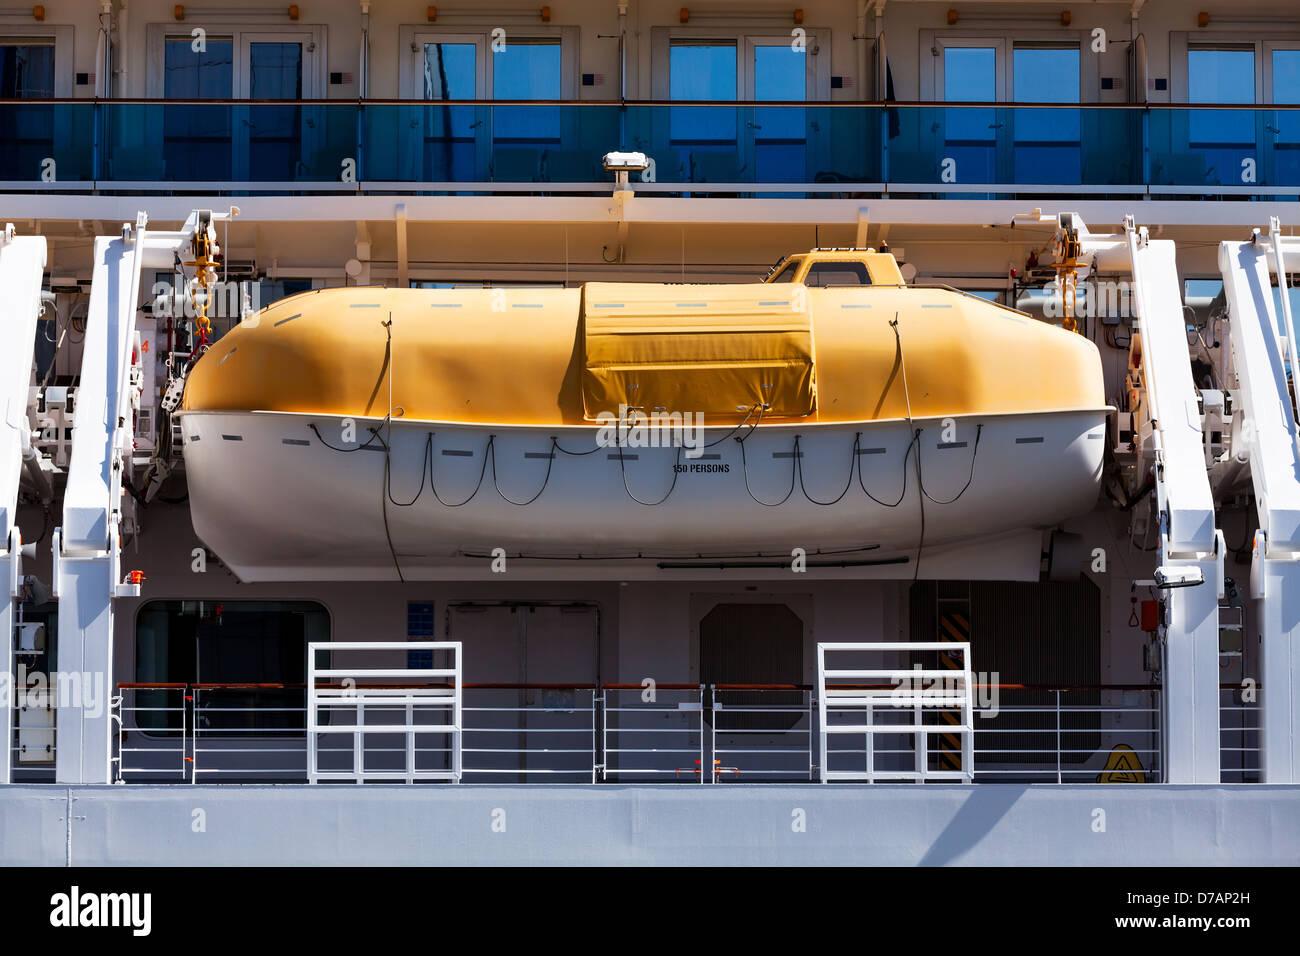 lifeboat passenger ship closeup side - Stock Image